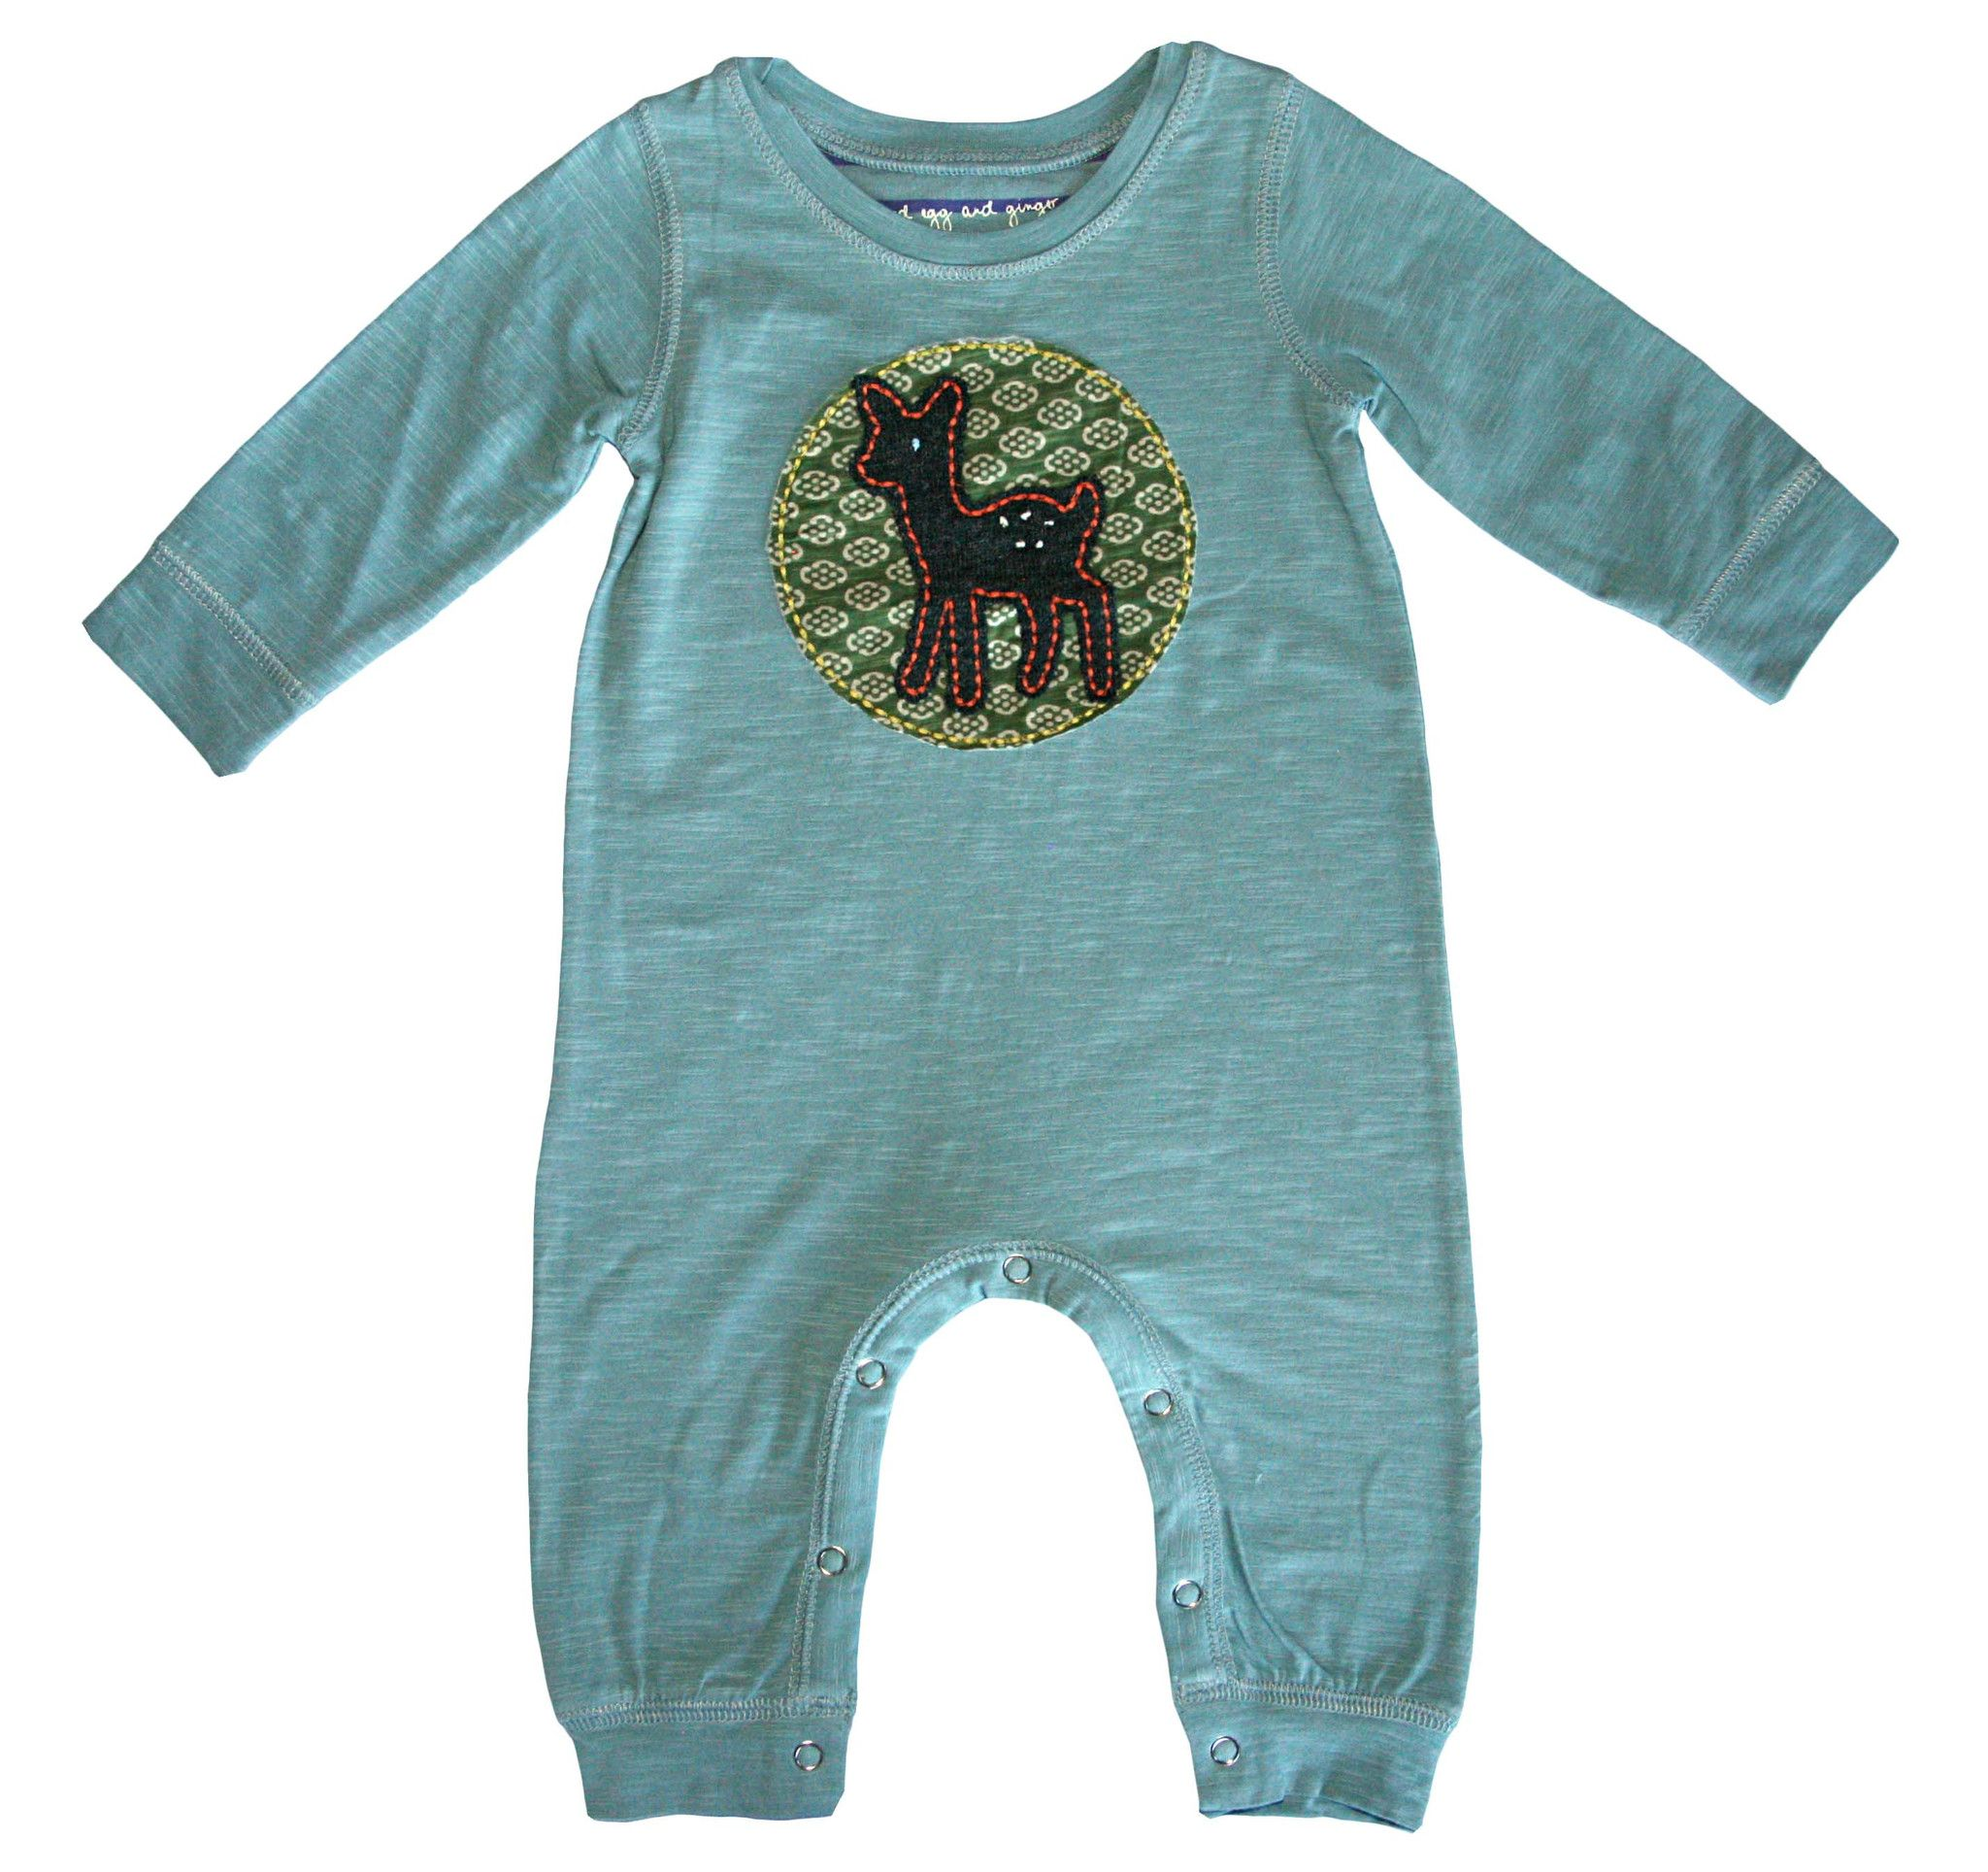 Heart Mashed Clothing Unisex Baby I Deer T-Shirt Romper